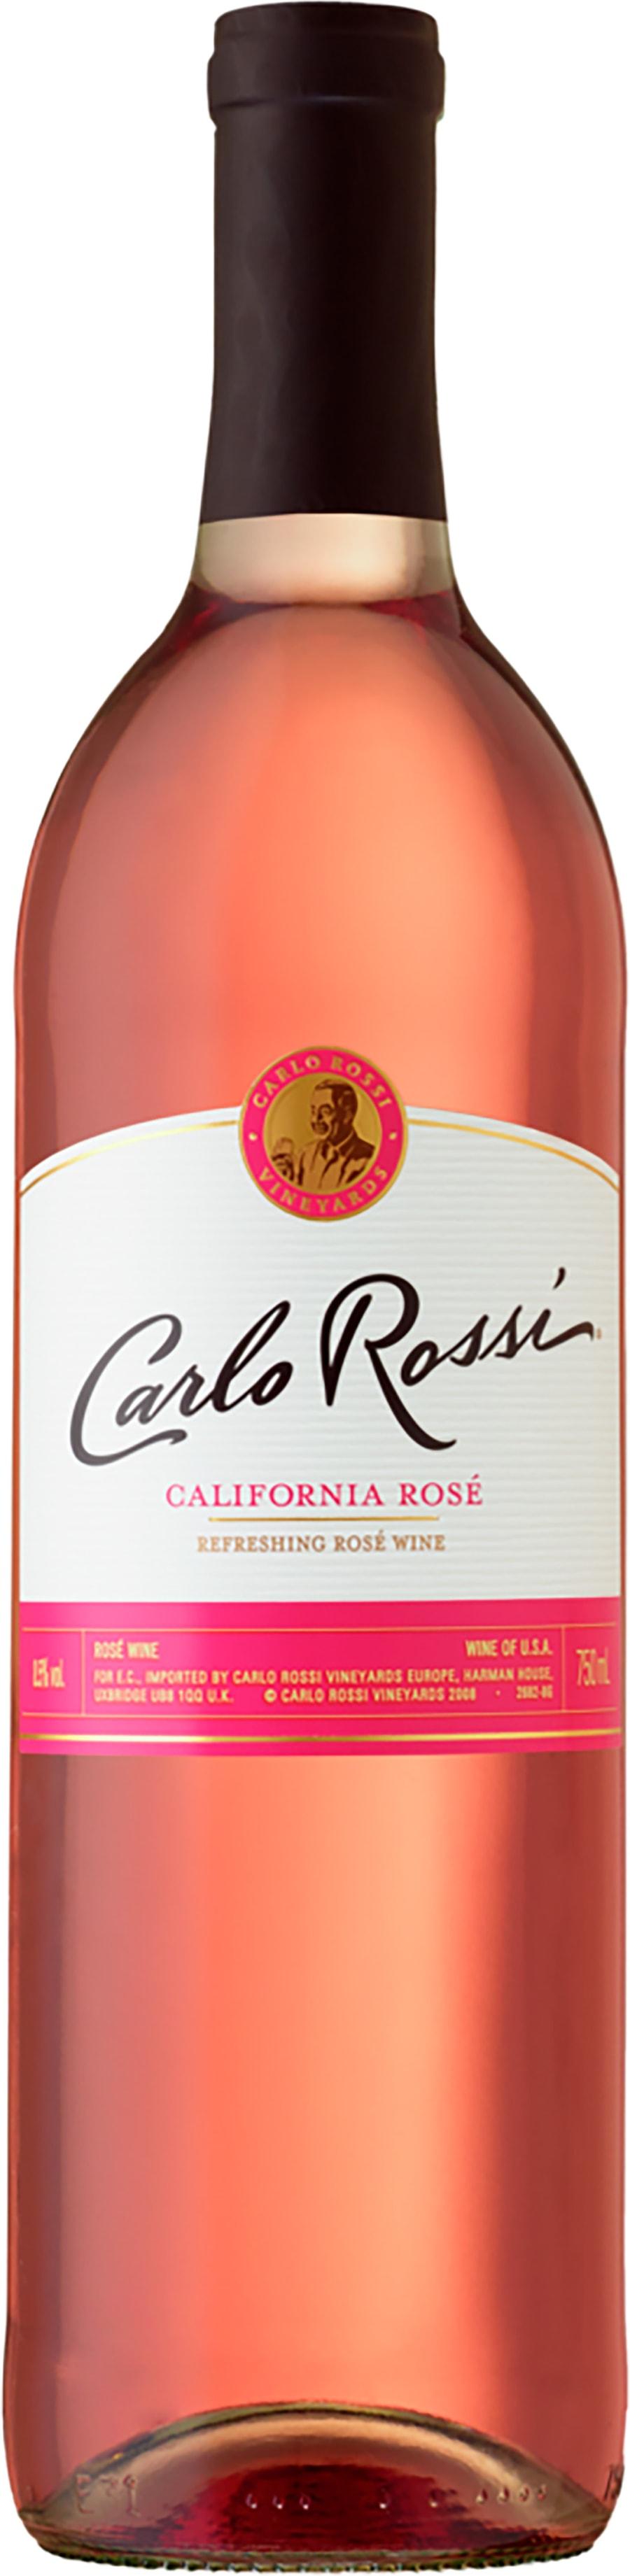 Carlo Rossi California Rose Alko